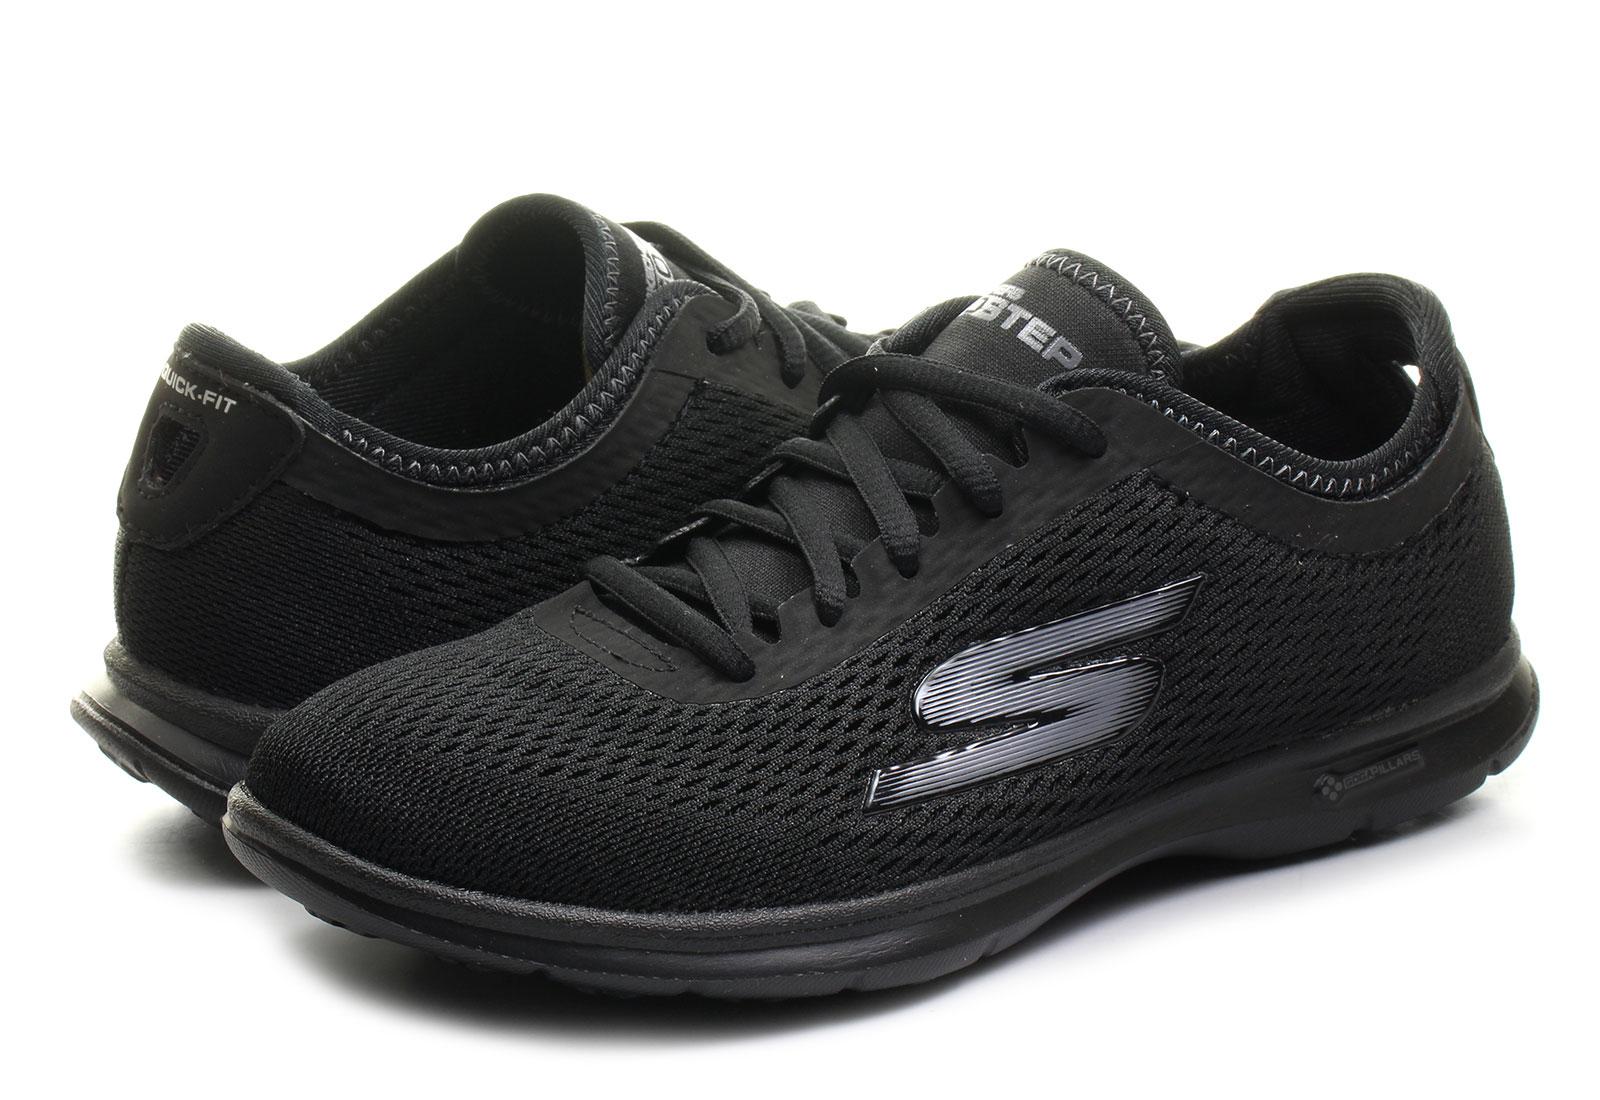 Skechers Shoes - Go Step Sport - 14211-bbk